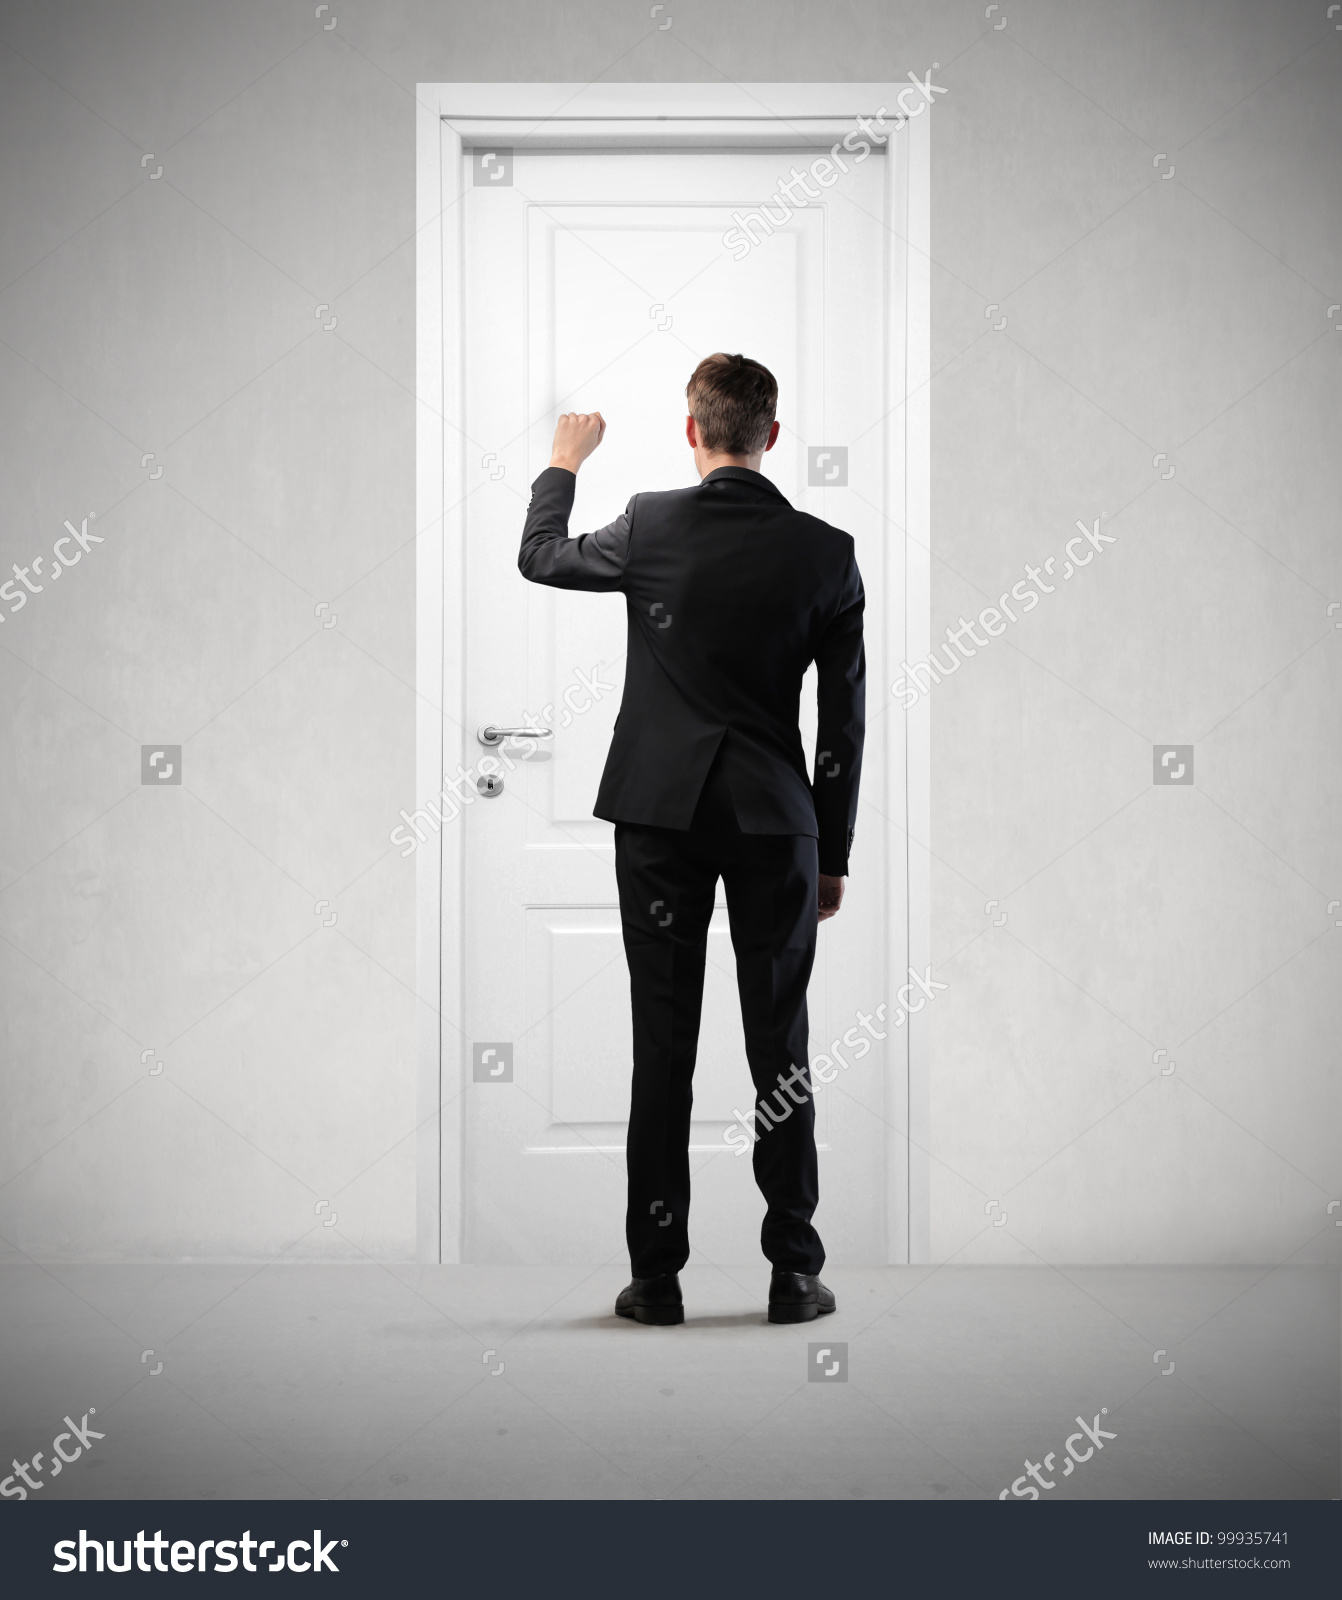 Black Man Knocking On Door Clipart.